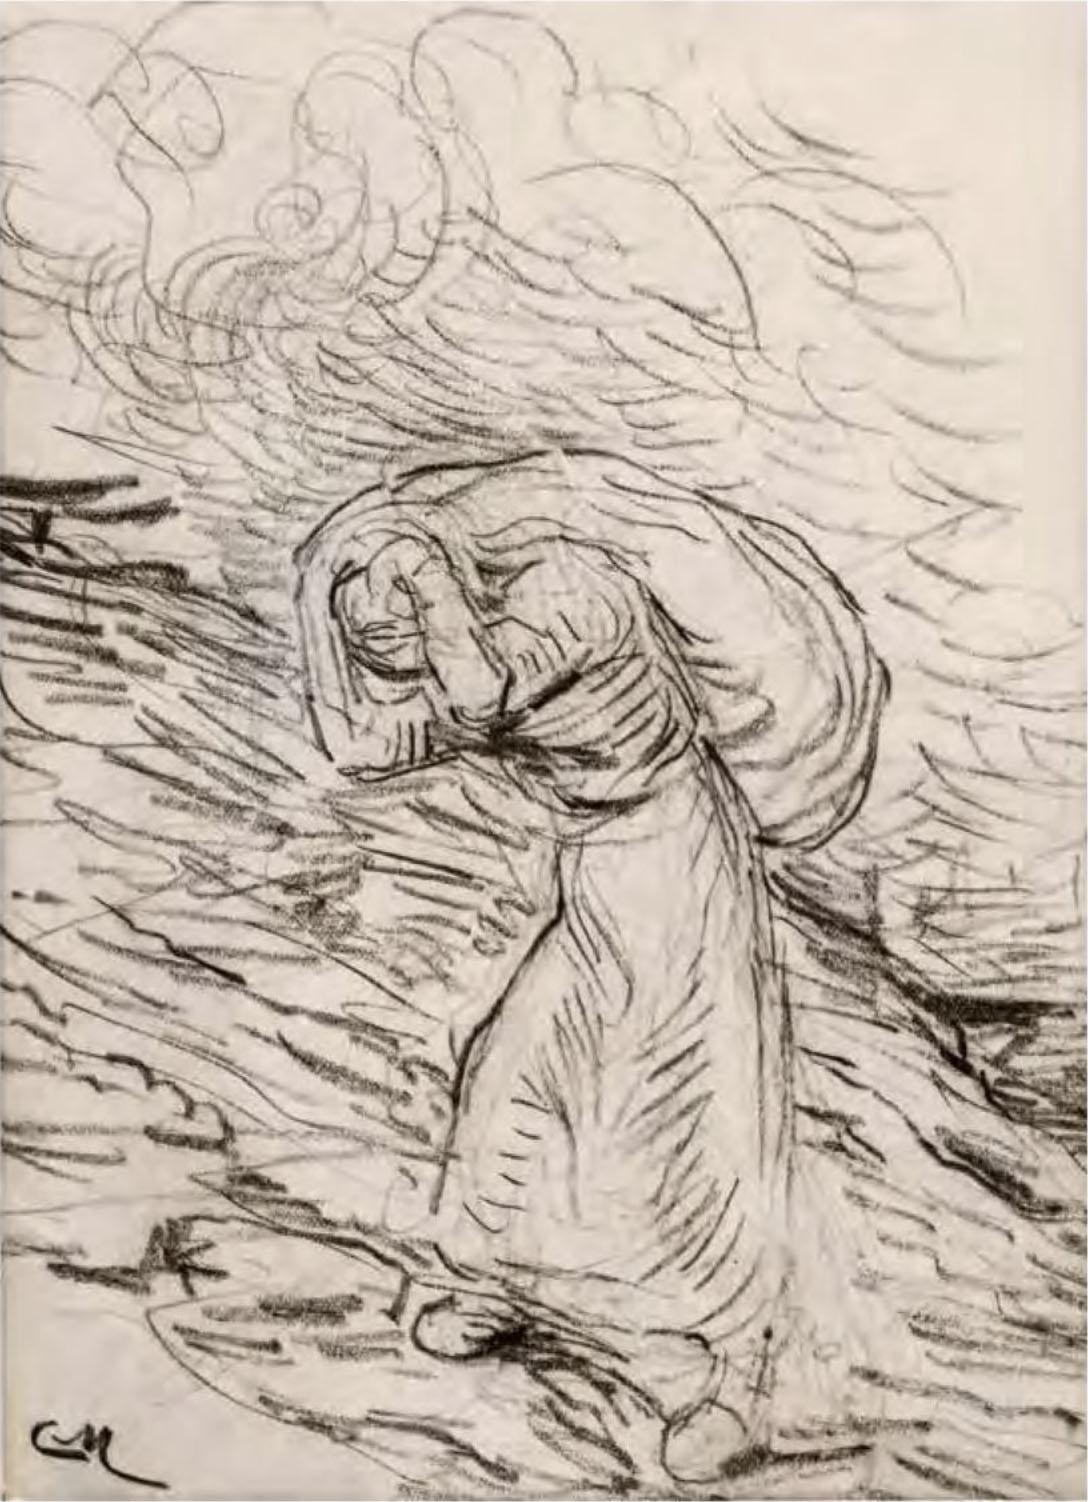 Constantin Meunier, Hiercheuse Climbing a Heap of Coal, after 1885, pencil and coal on paper. Collection of Sura Levine.